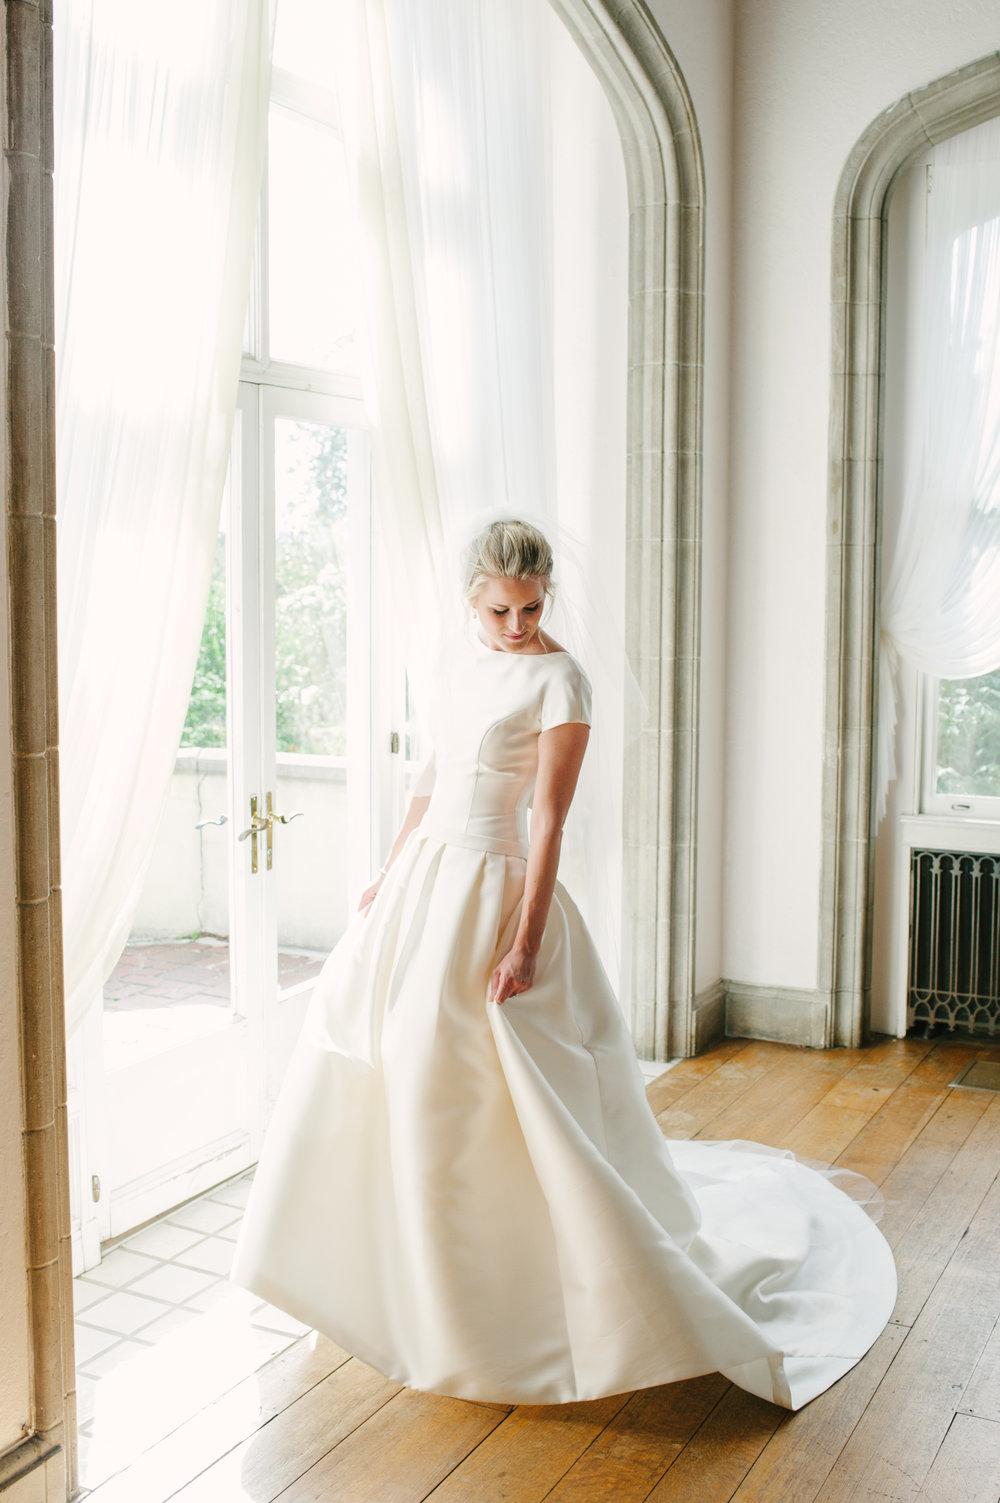 Callanwolde Fine Arts Center Bridal Portrait Session Atlanta-1003.jpg